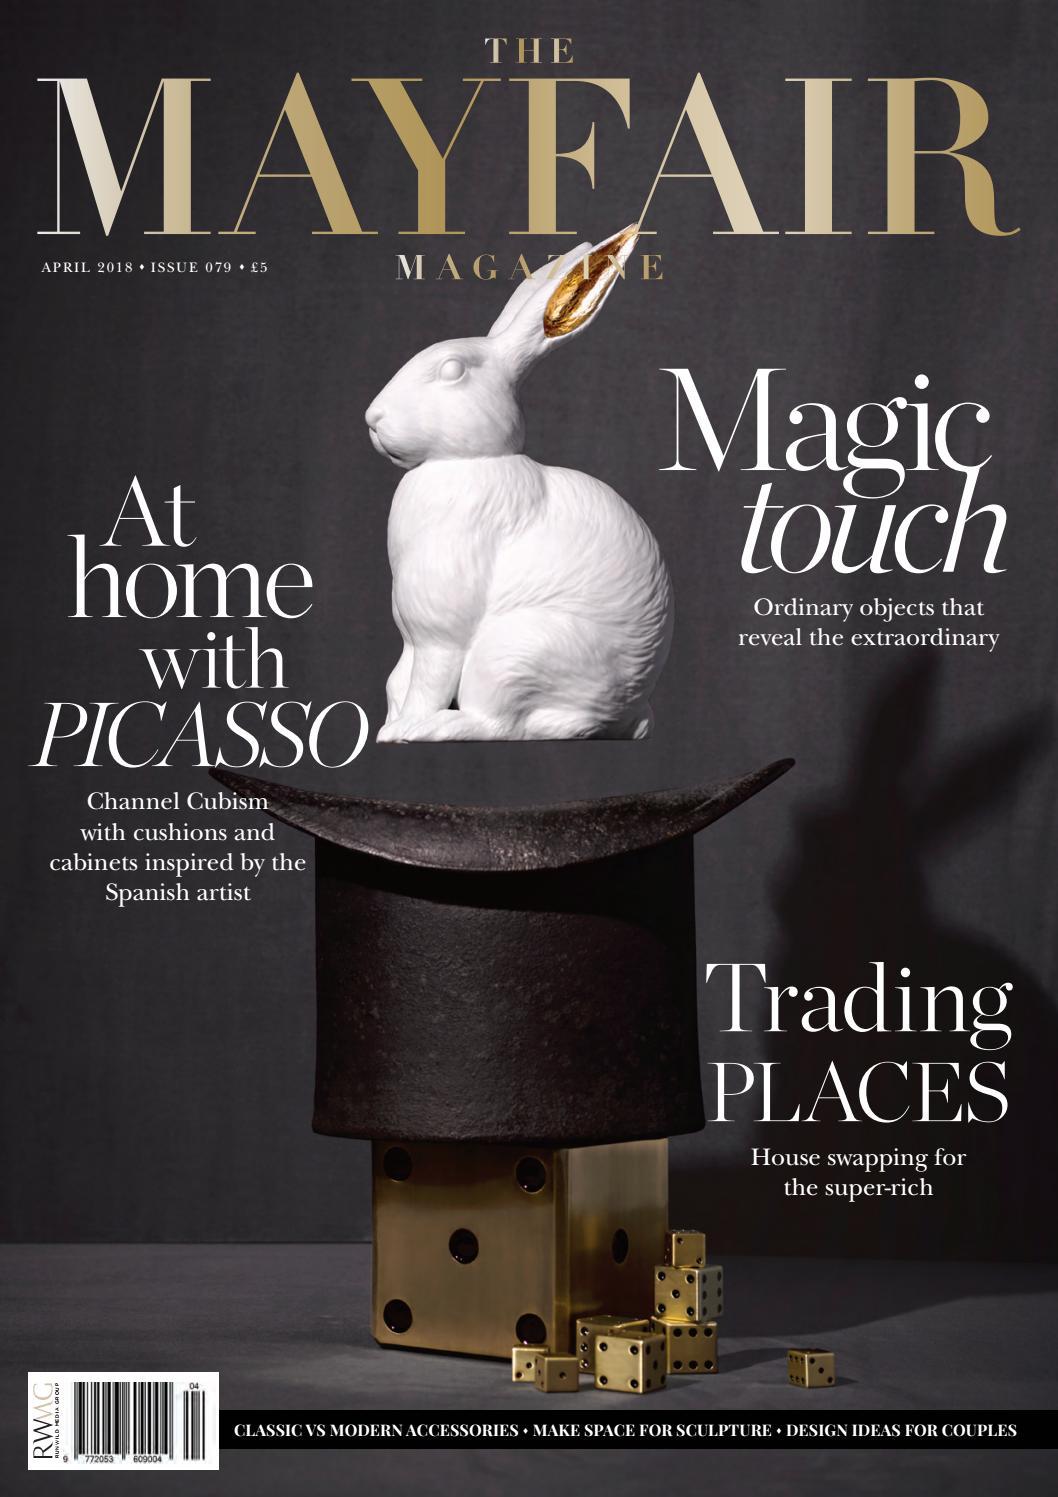 4e84333cd468 Mayfair Magazine - April 18 by Runwild Media Group - issuu